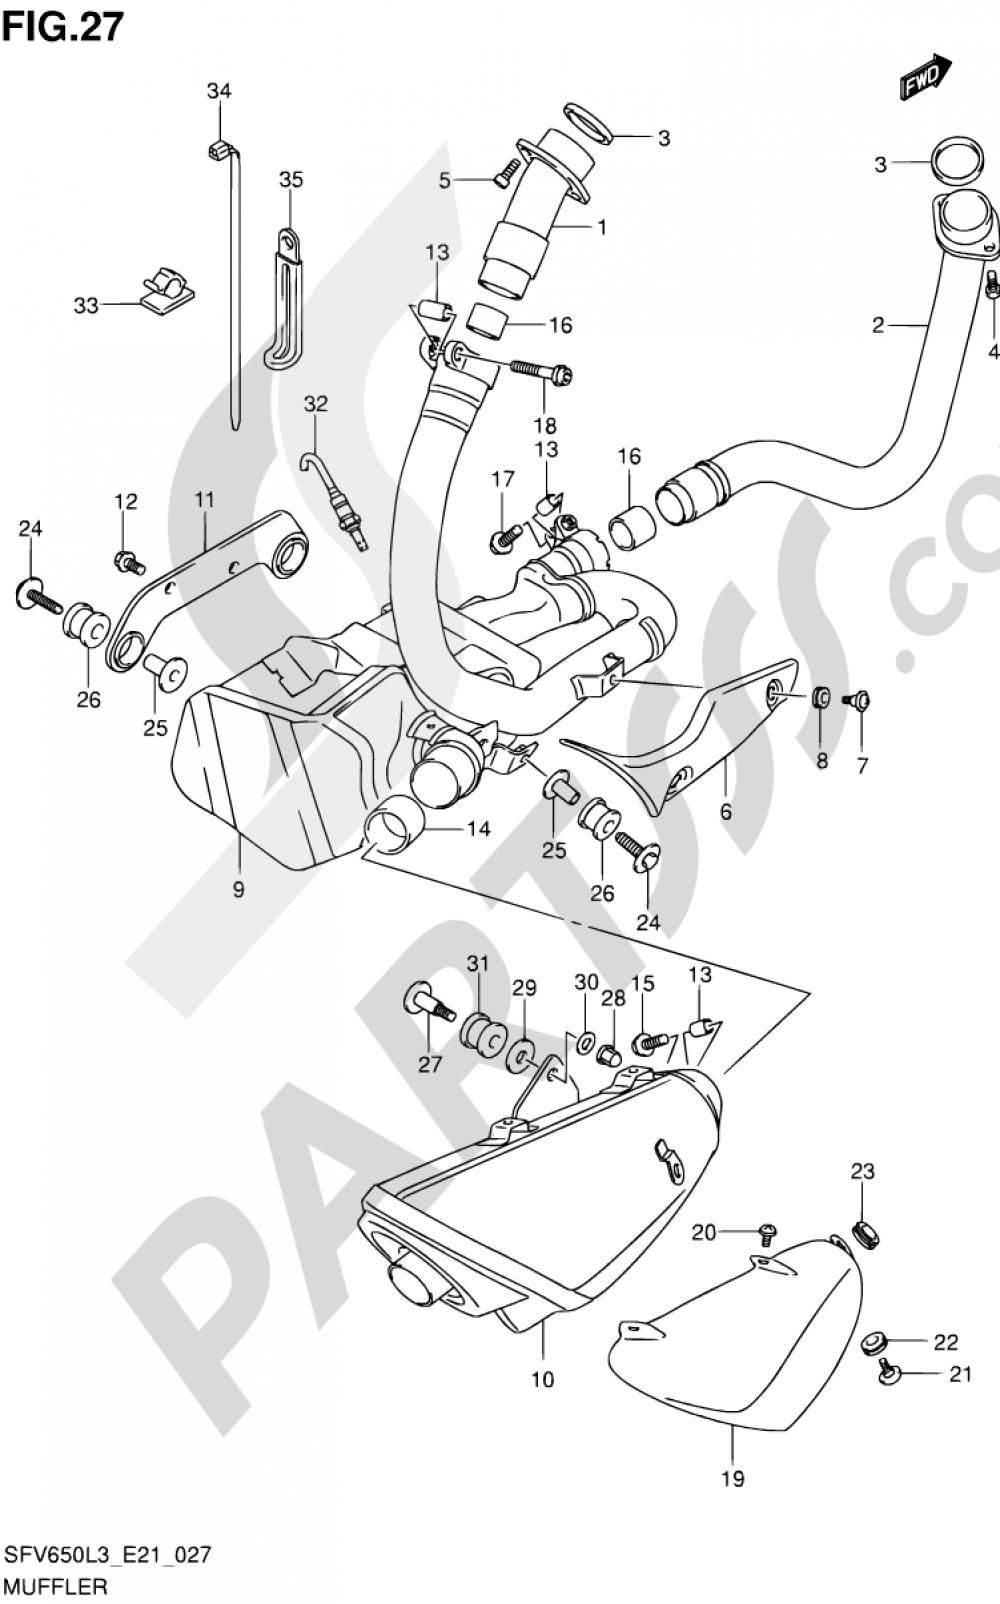 27 - MUFFLER (SFV650AL3 E21) Suzuki GLADIUS SFV650 2013